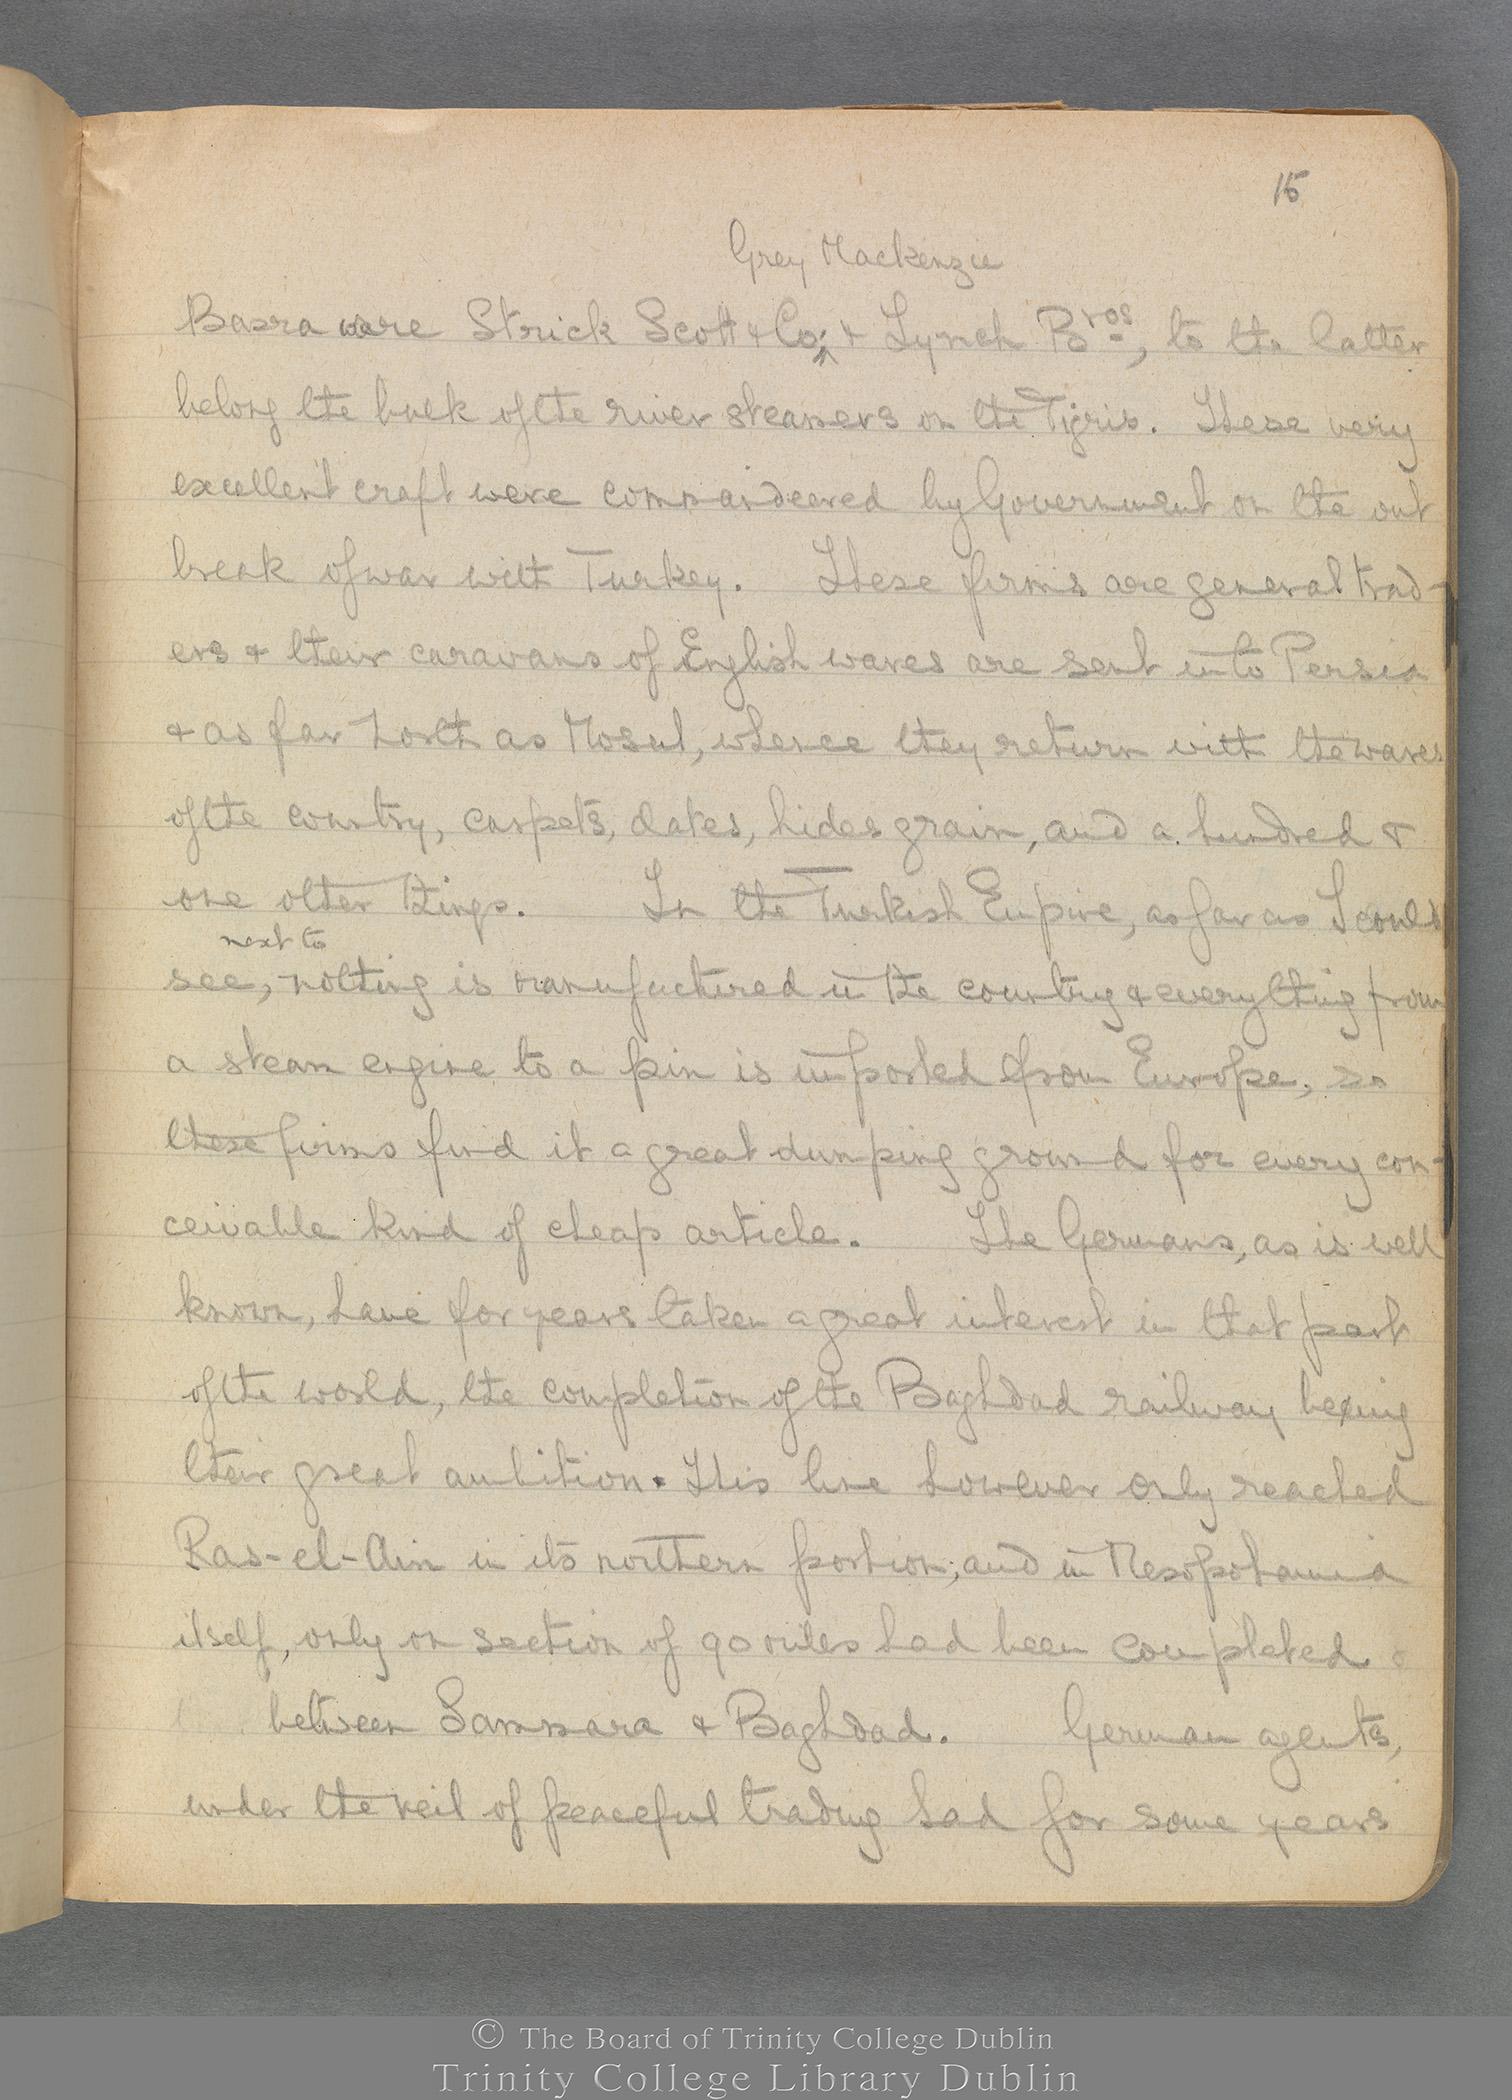 TCD MS 3414 folio 15 recto